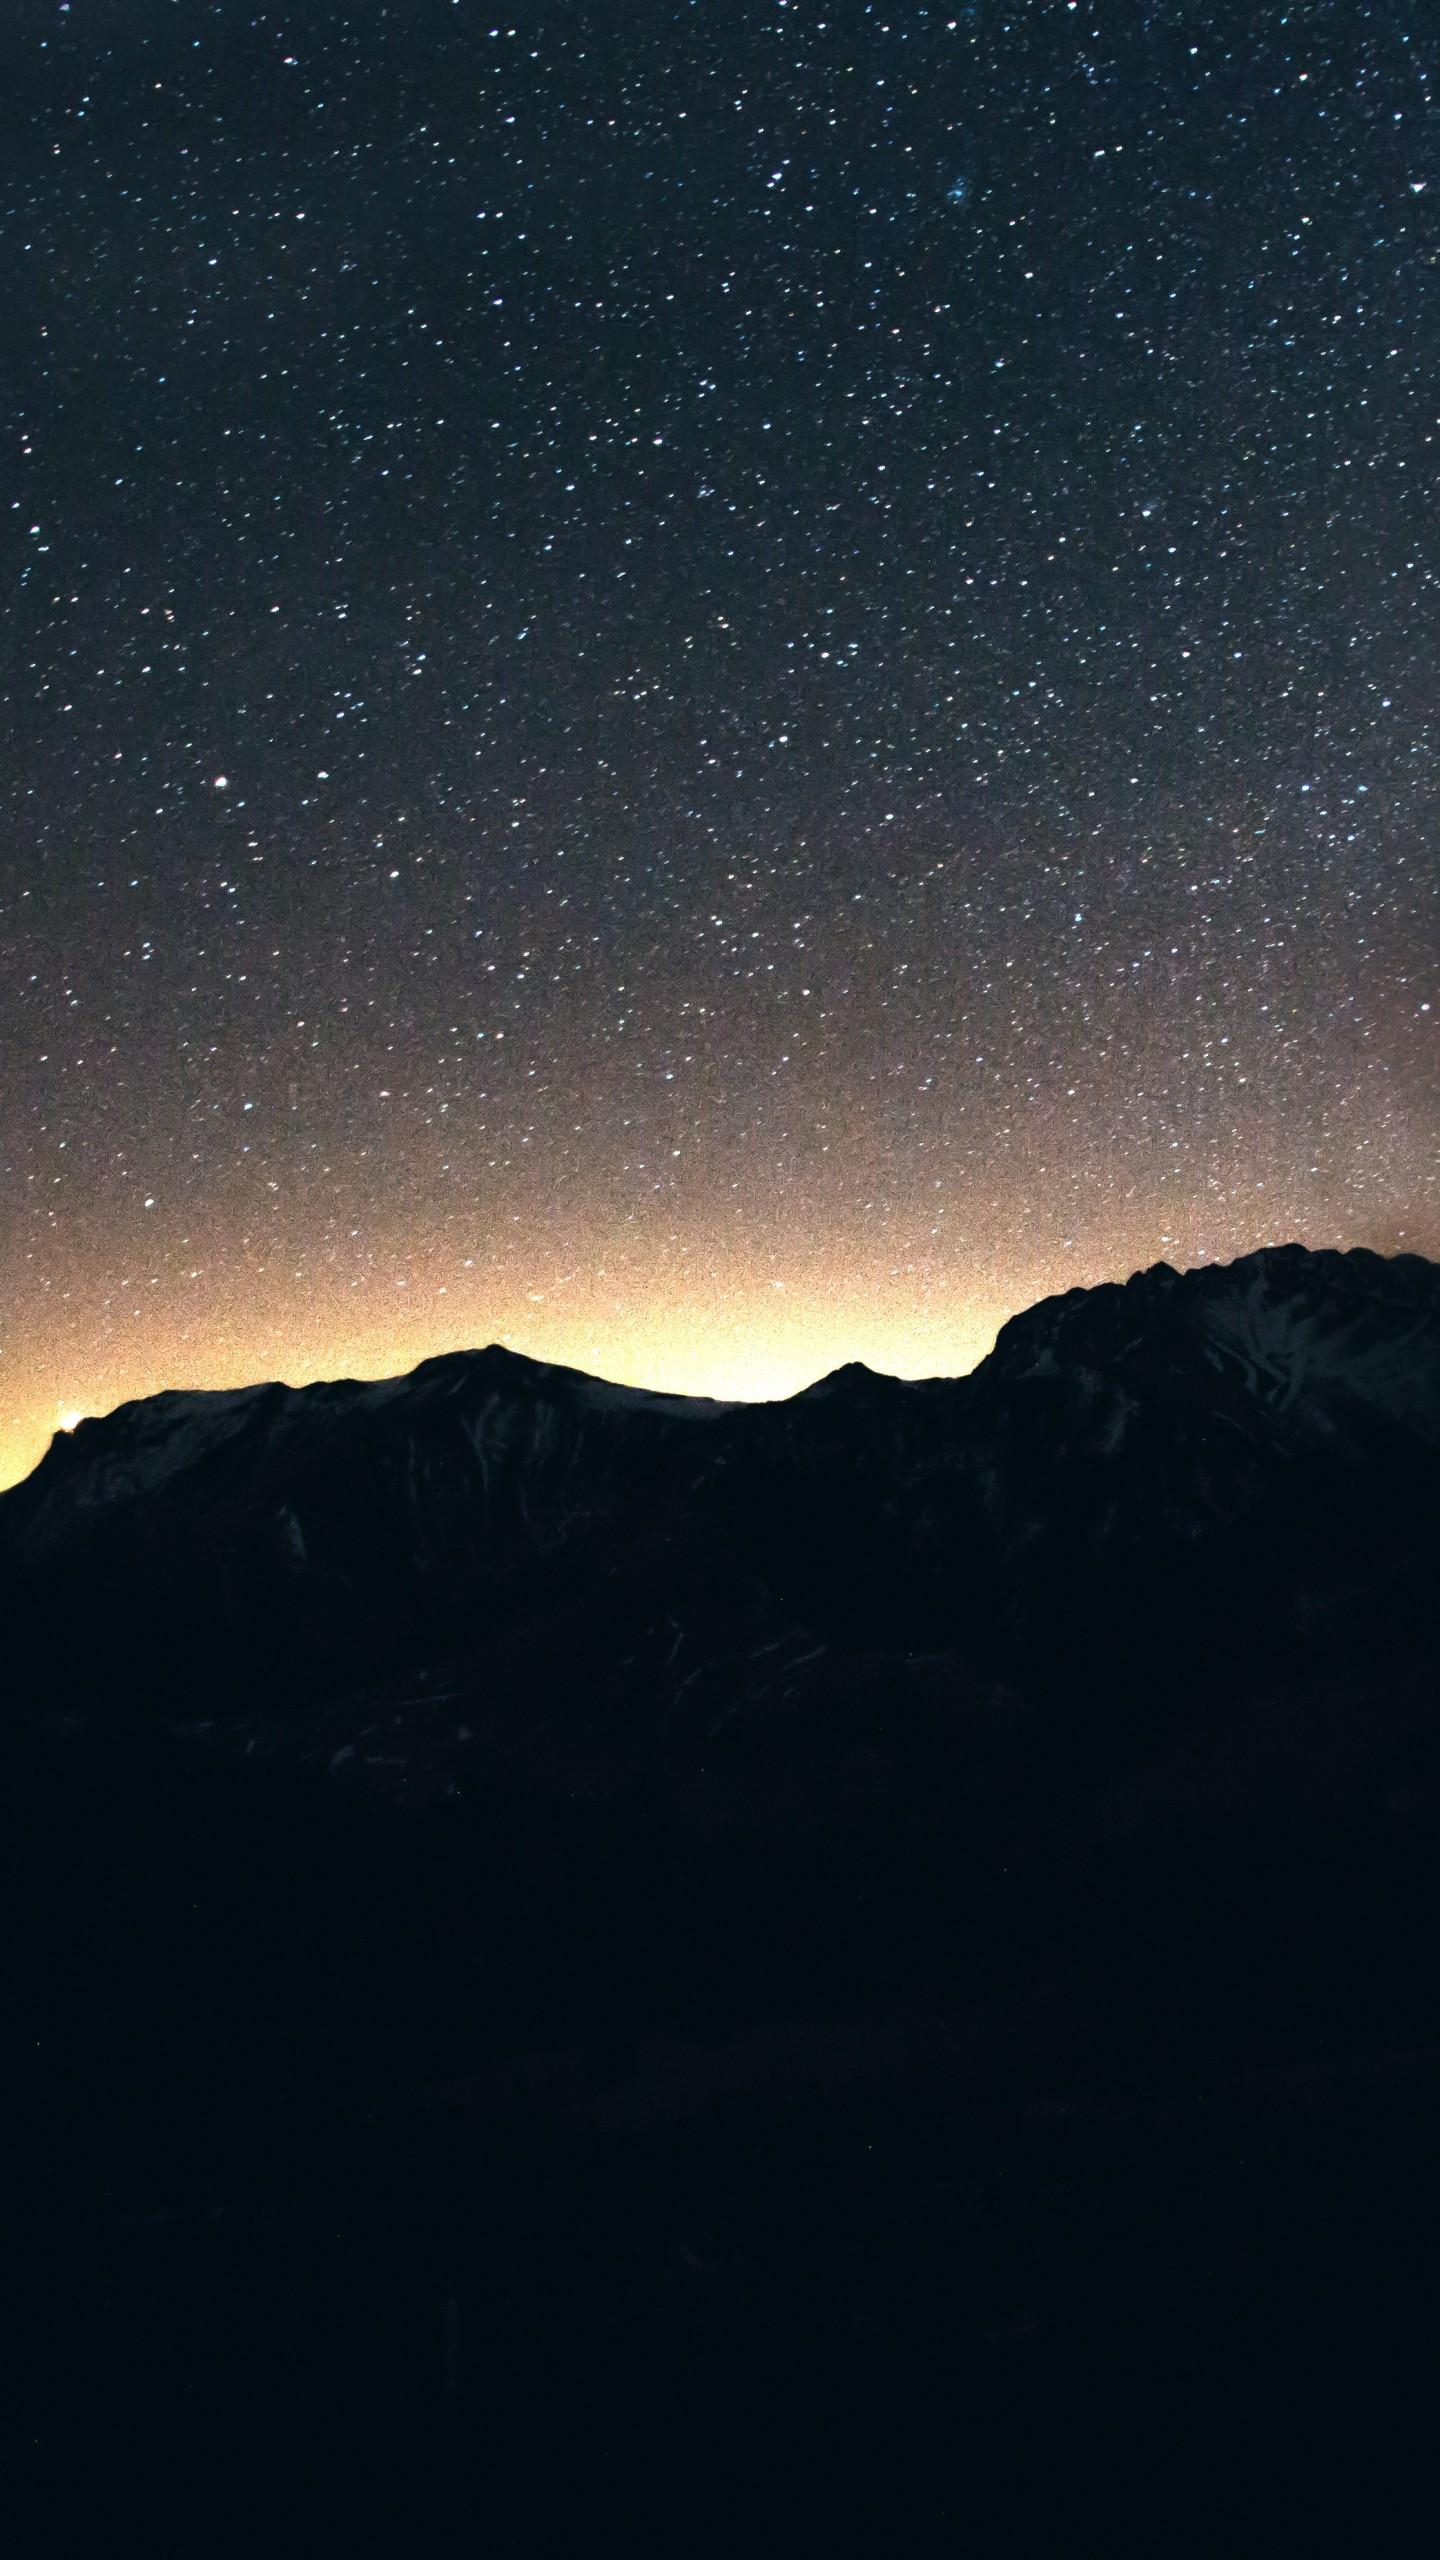 Wallpaper Night Sky Mountains 8k Nature 17040